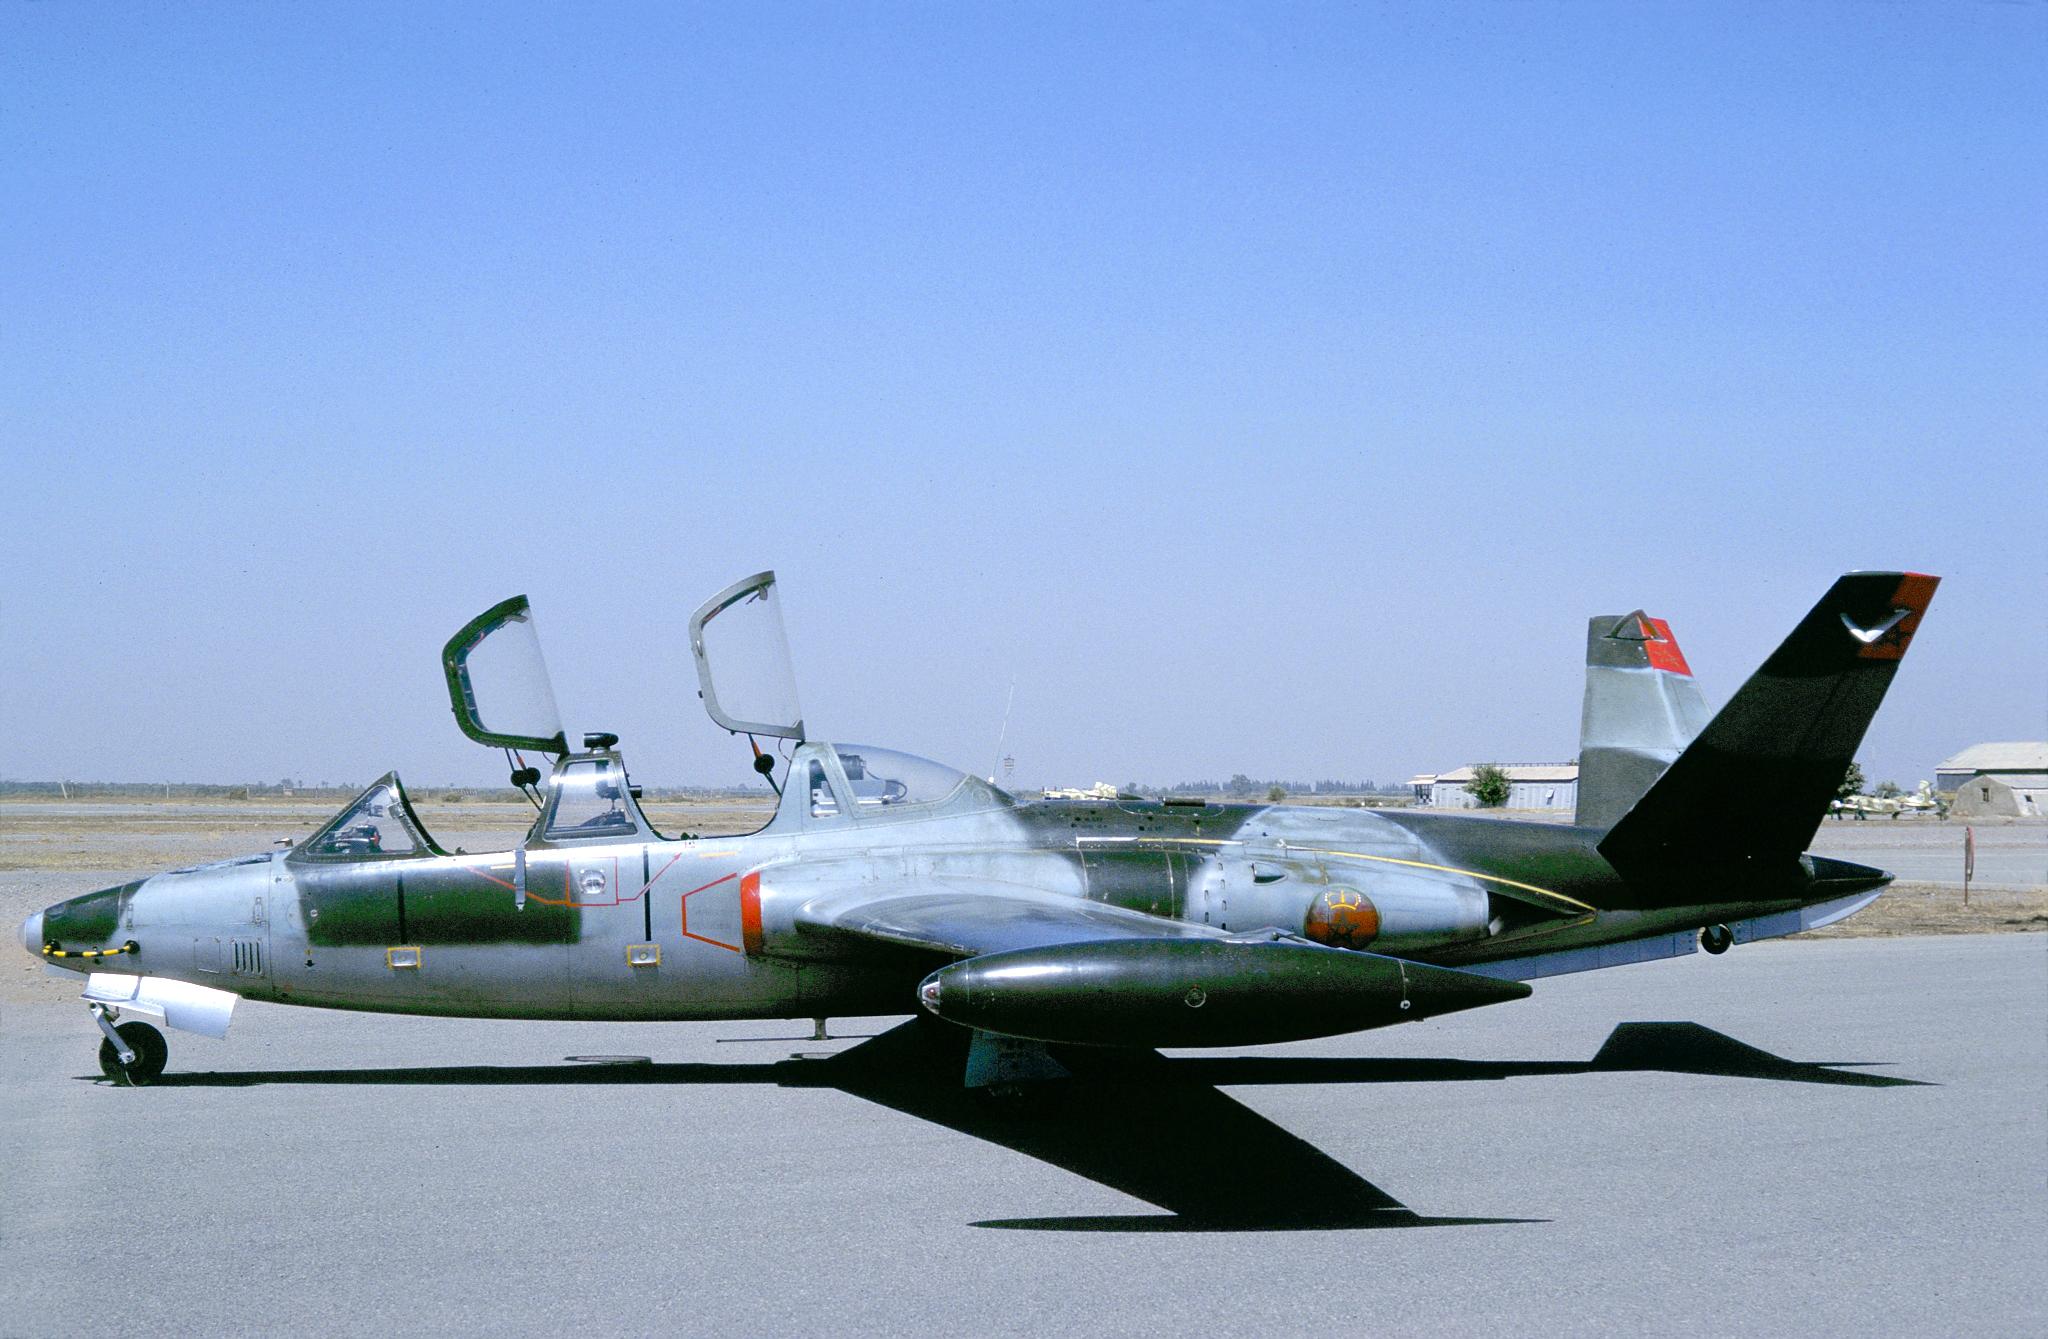 FRA: Photos anciens avions des FRA - Page 13 31221341401_f2cc5ce676_o_d